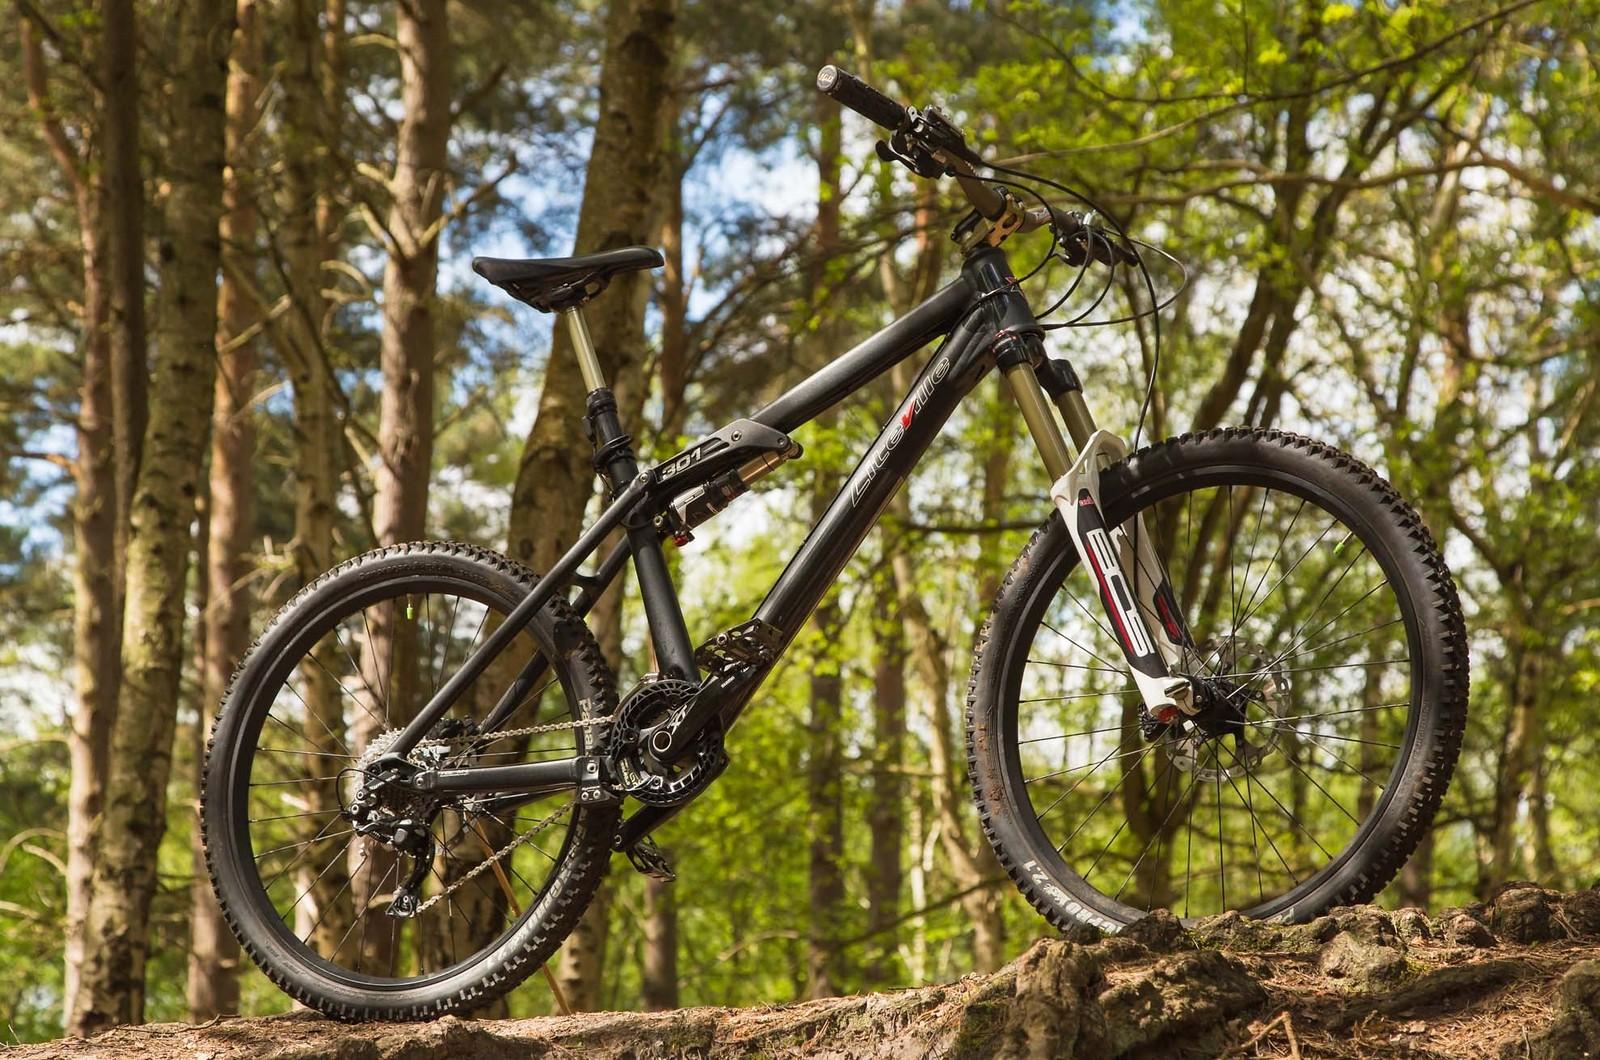 Liteville 301 mk11 m  1 - teknorob - Mountain Biking Pictures - Vital MTB